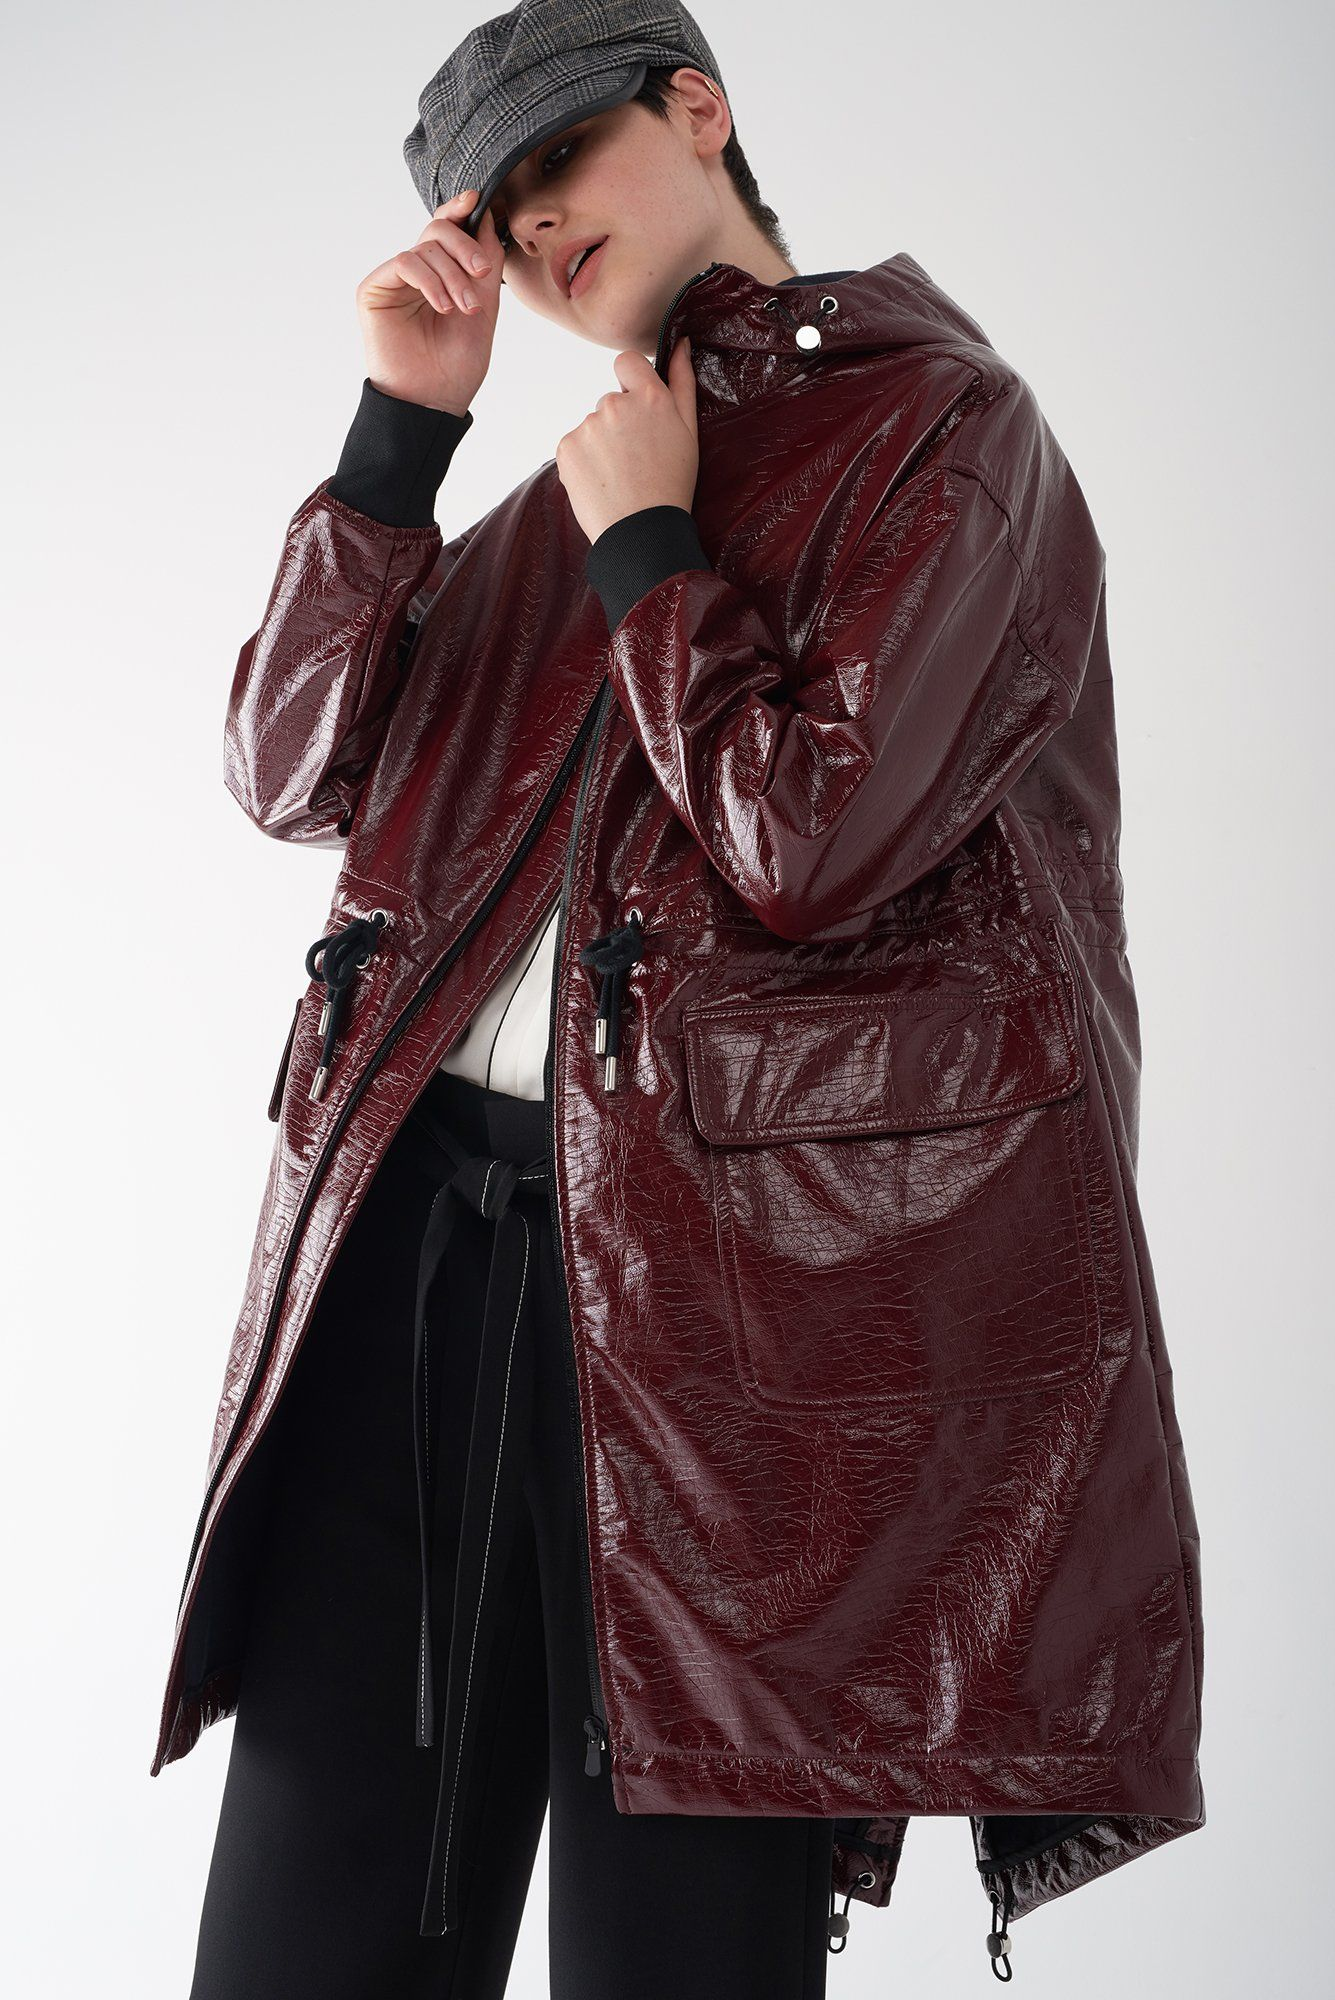 GRETA OXBLOOD Patent Leather Raincoat Raincoat